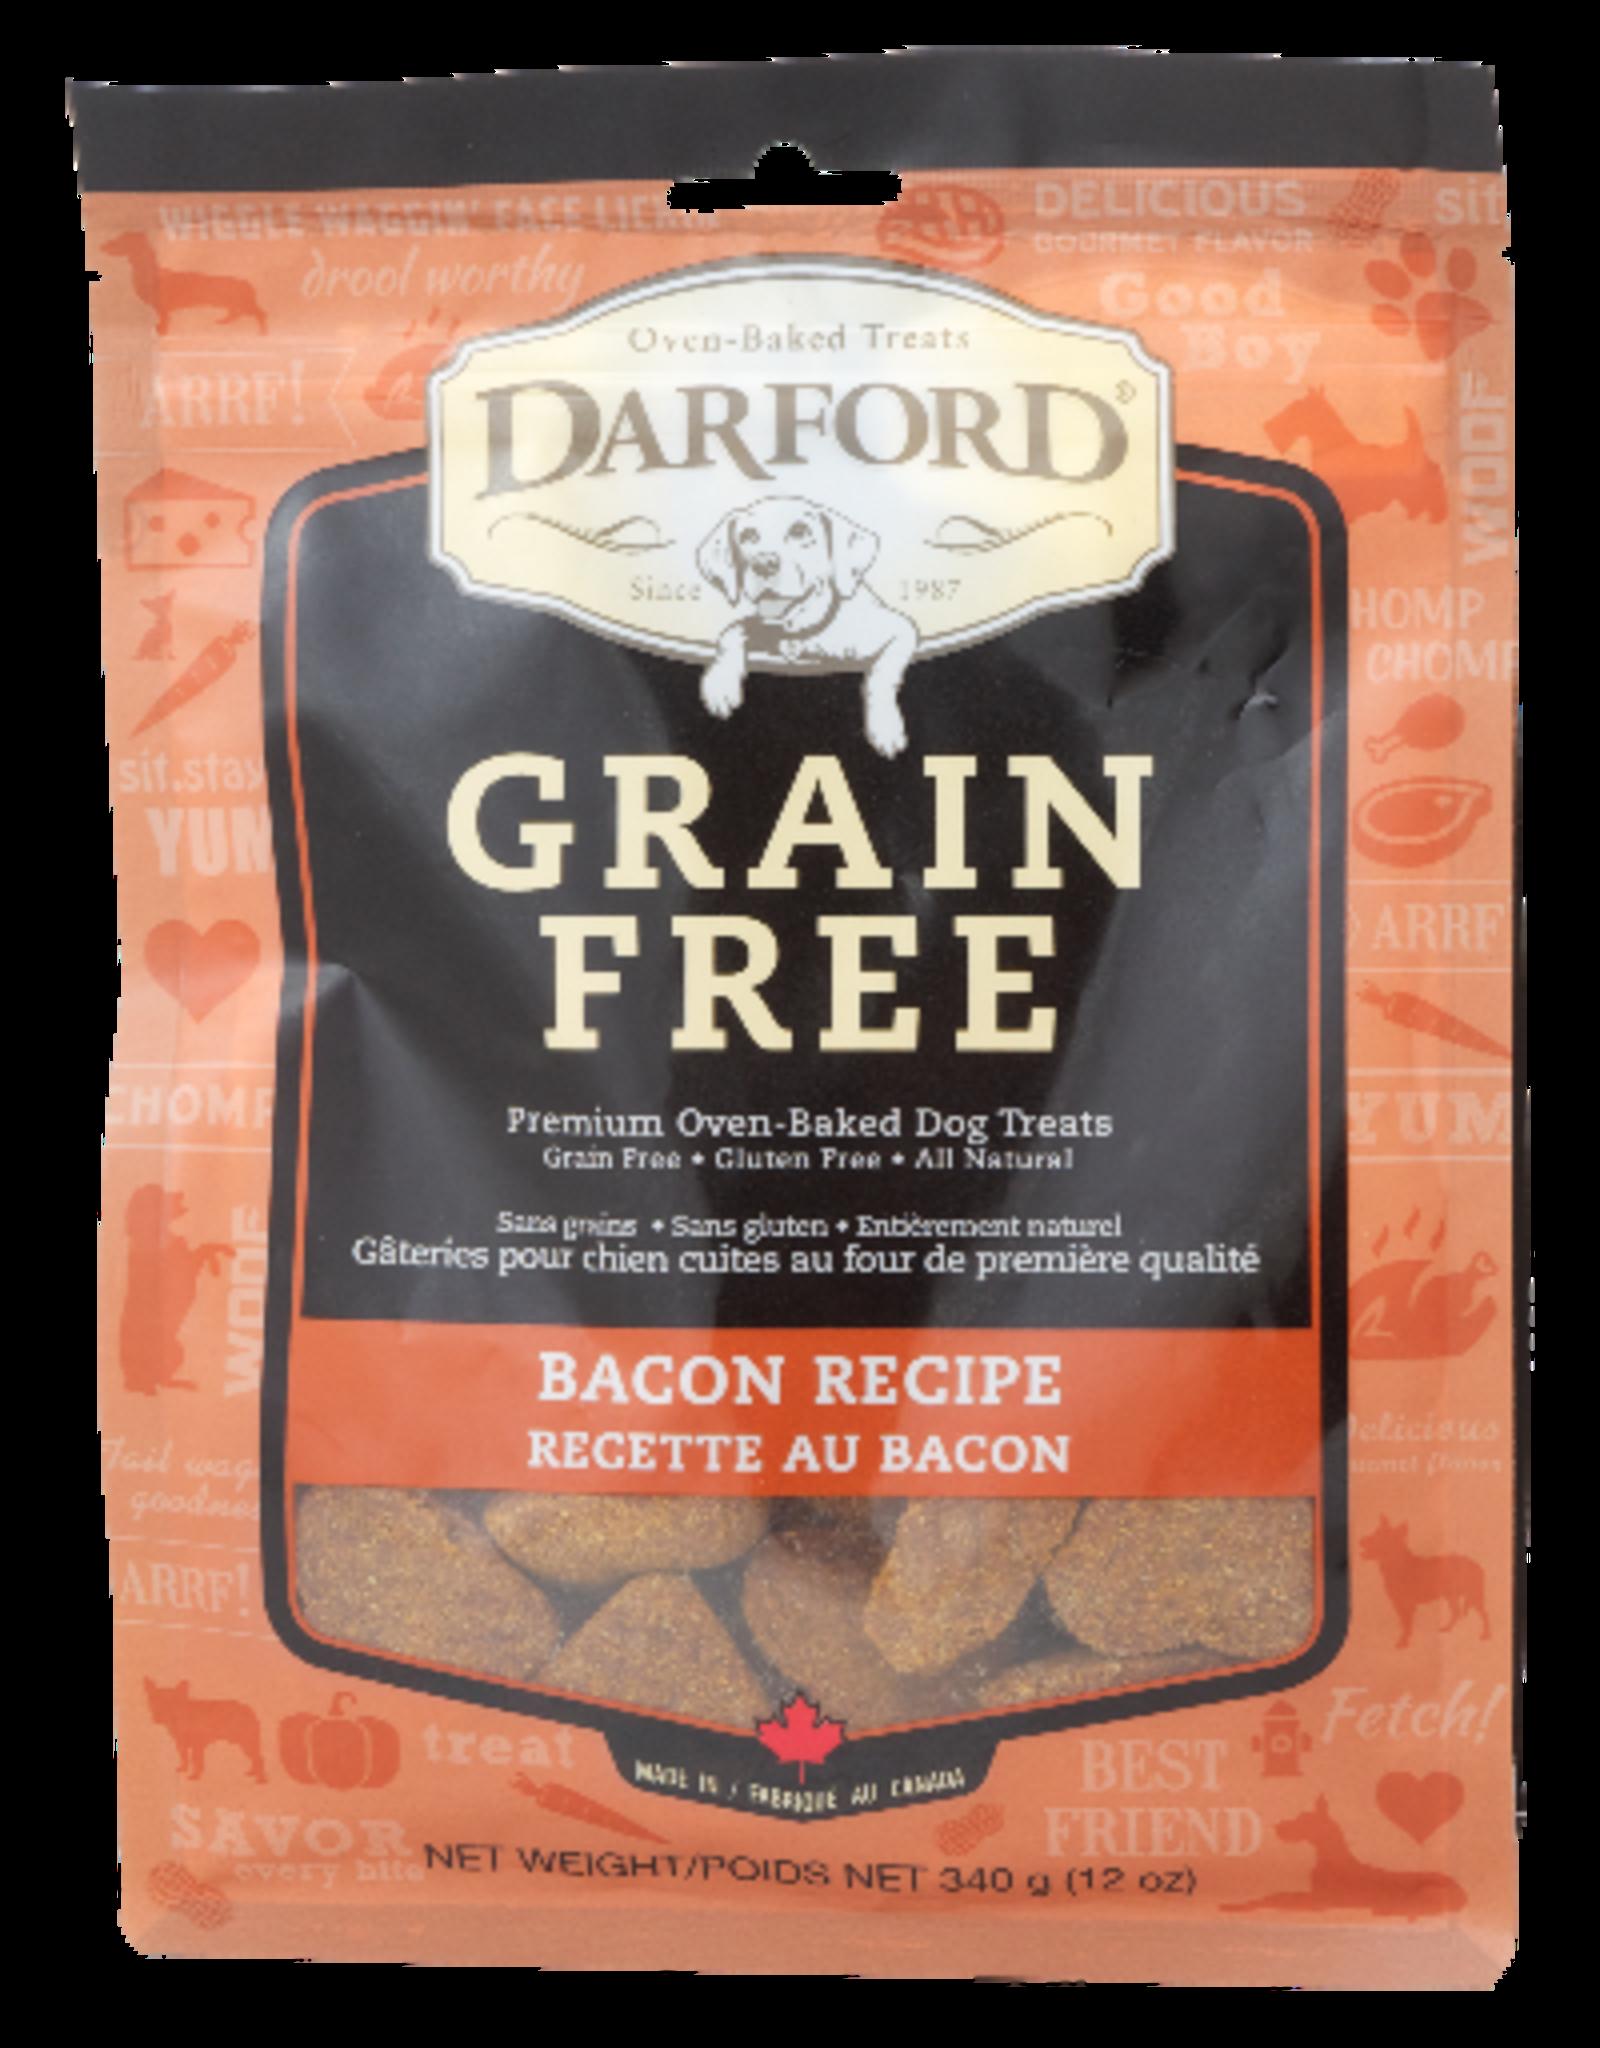 DARFORD Darford | Grain Free Dog Treats